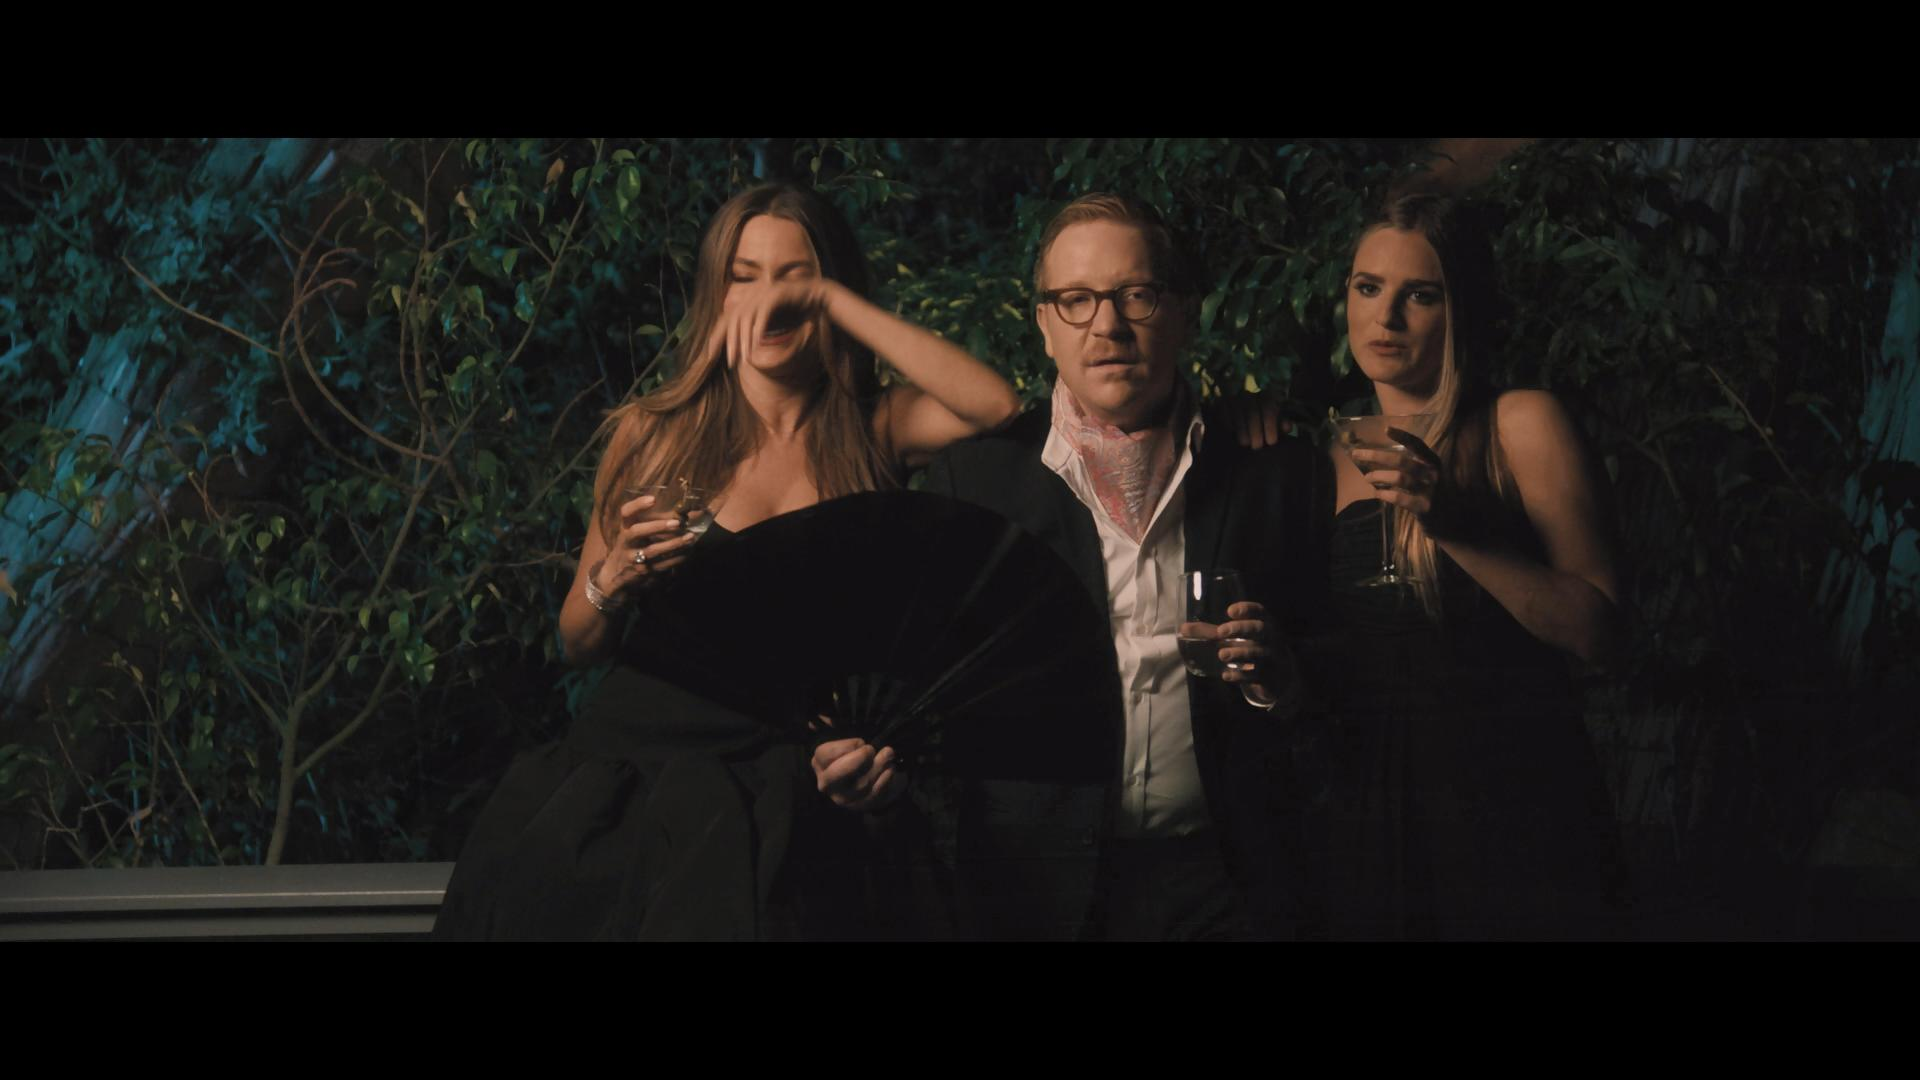 Sofía Vergara, Ethan Cohn, and Nathalie Love in The Con Is On (2018)